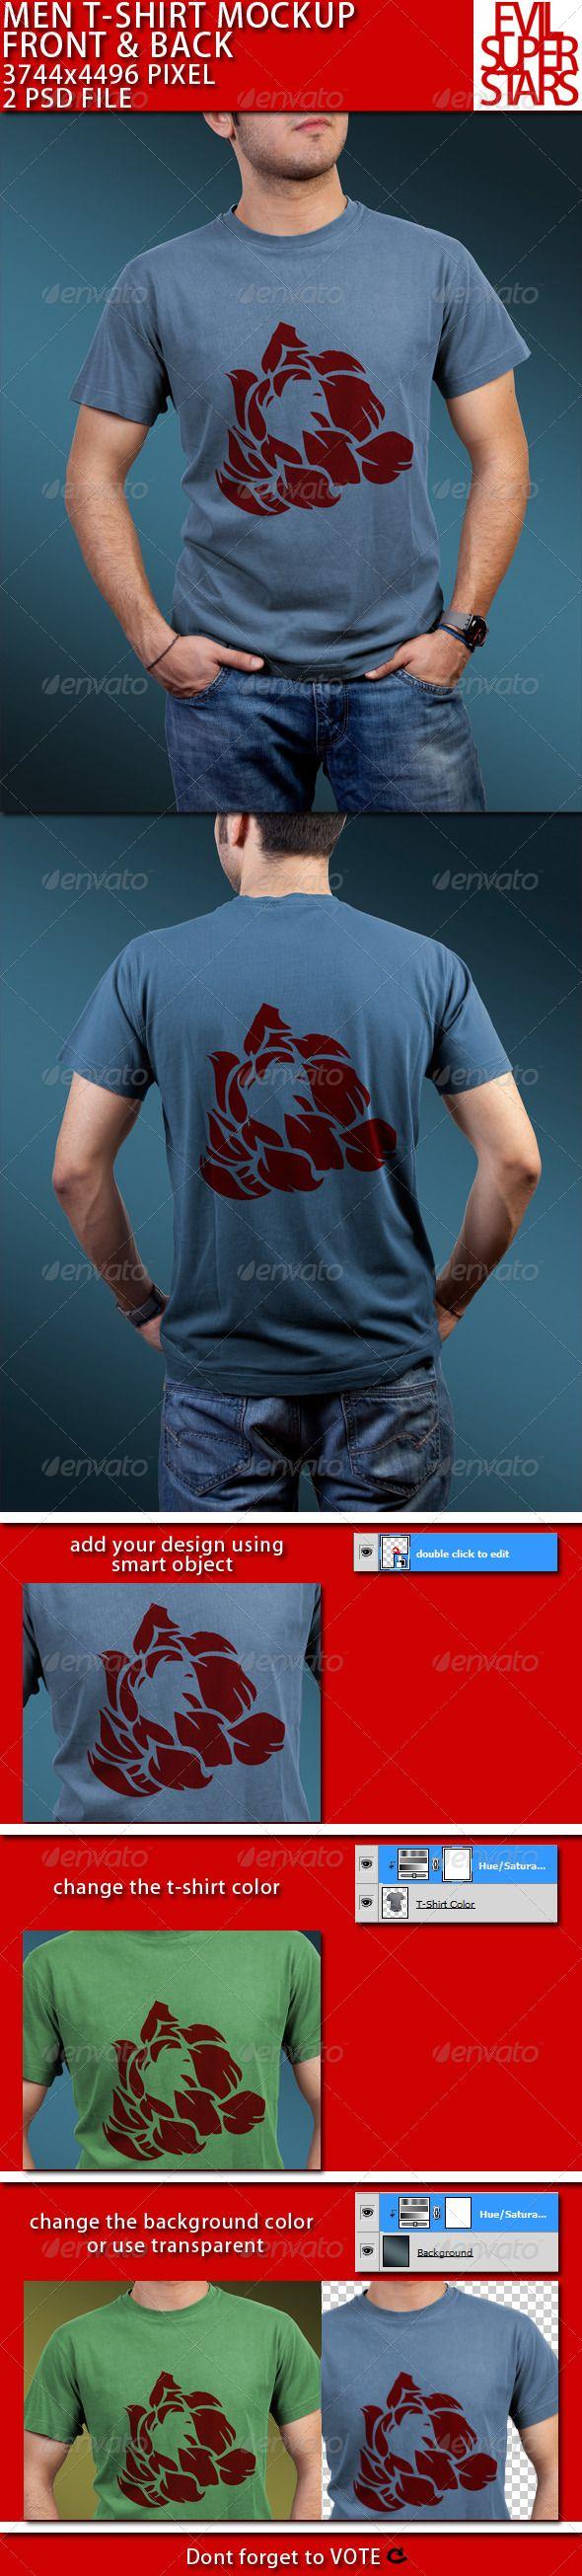 Download T Shirt Mock Up Male T Shirt Design Template Clothing Mockup Tshirt Mockup